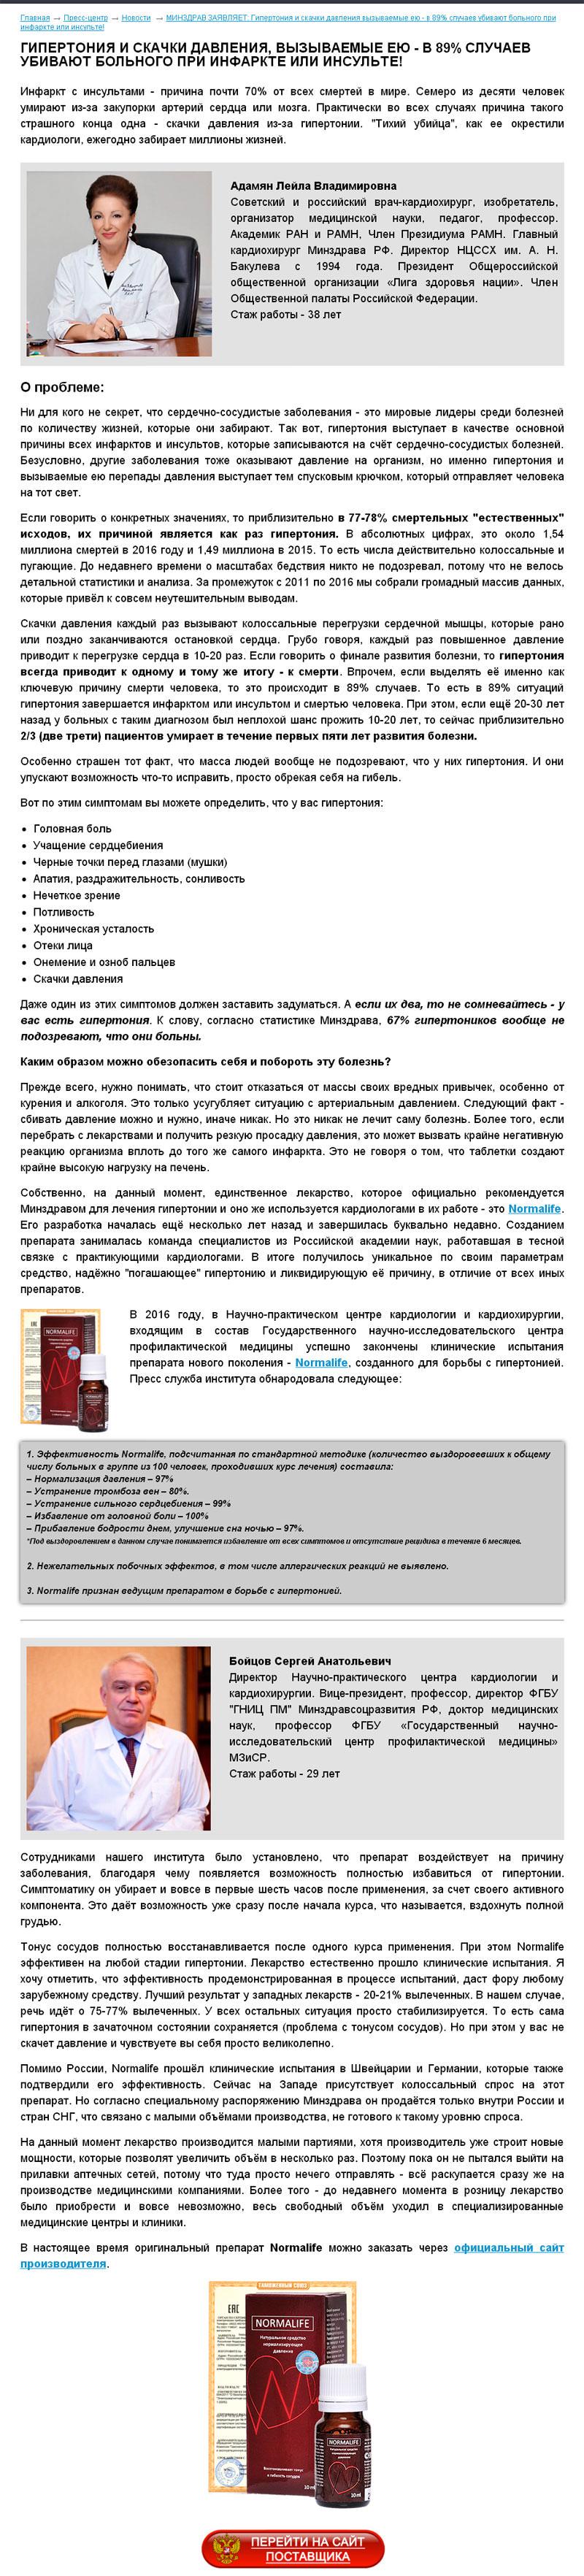 Инструкция лекарственного препарата (средства) от гипертонии normalife (нормолайф)